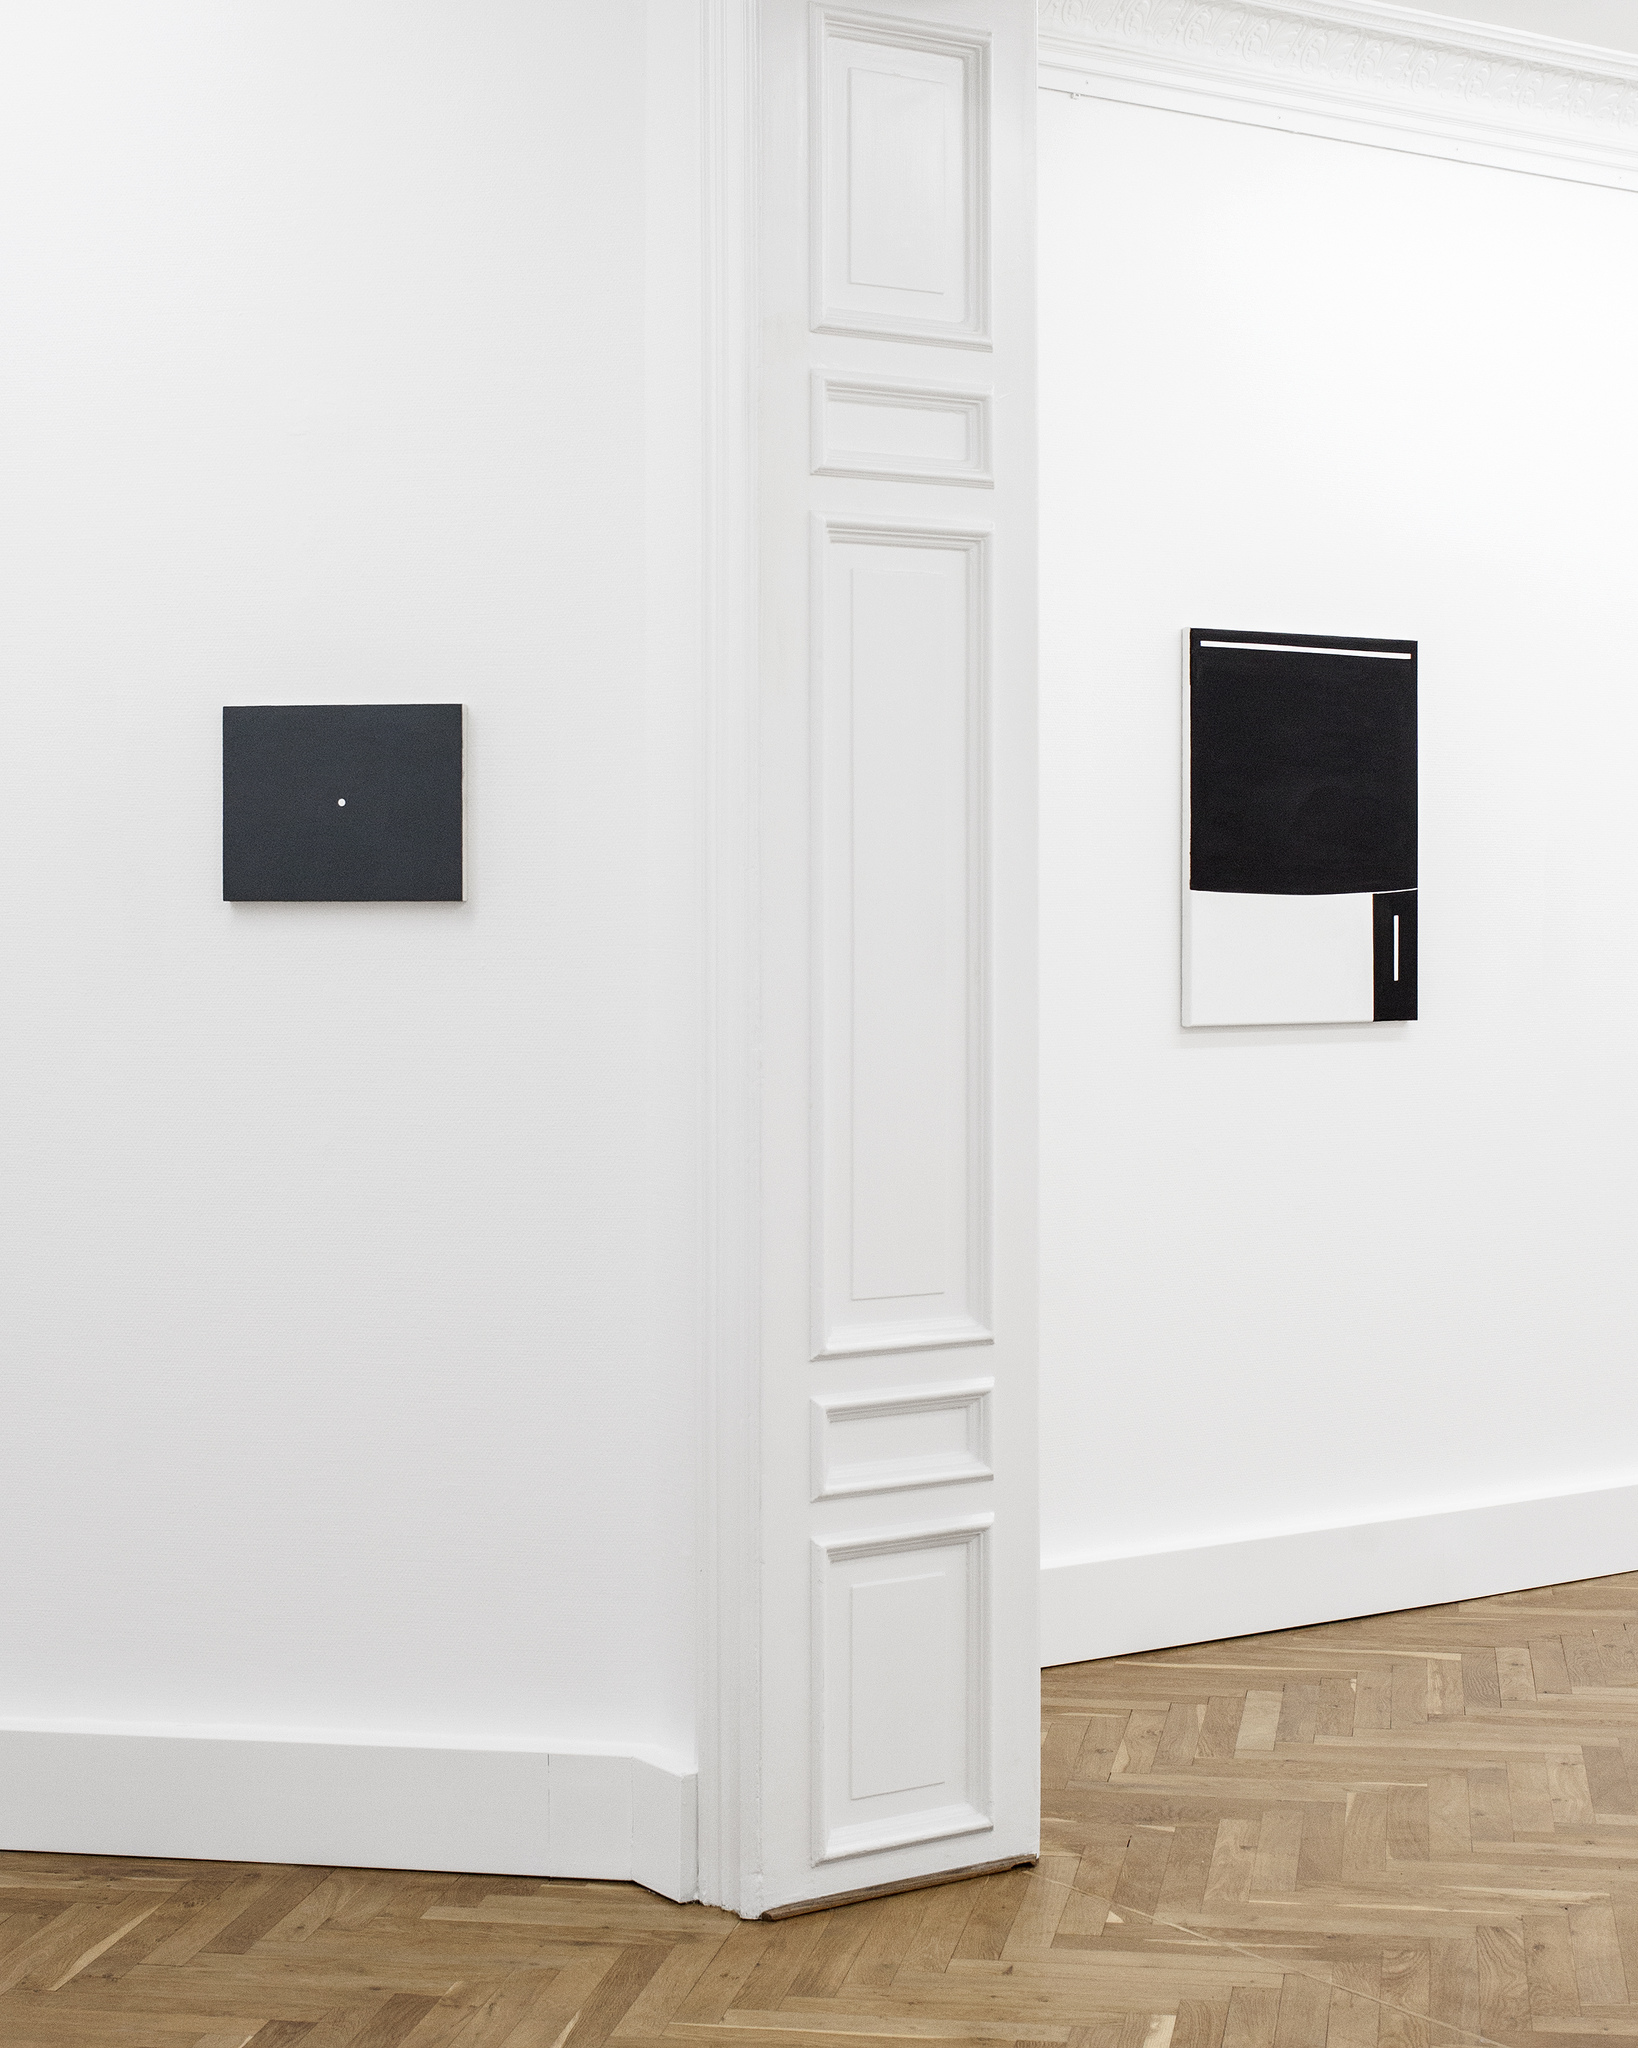 1-1-andre-butzer-matthew-feyld-sundays-gallery